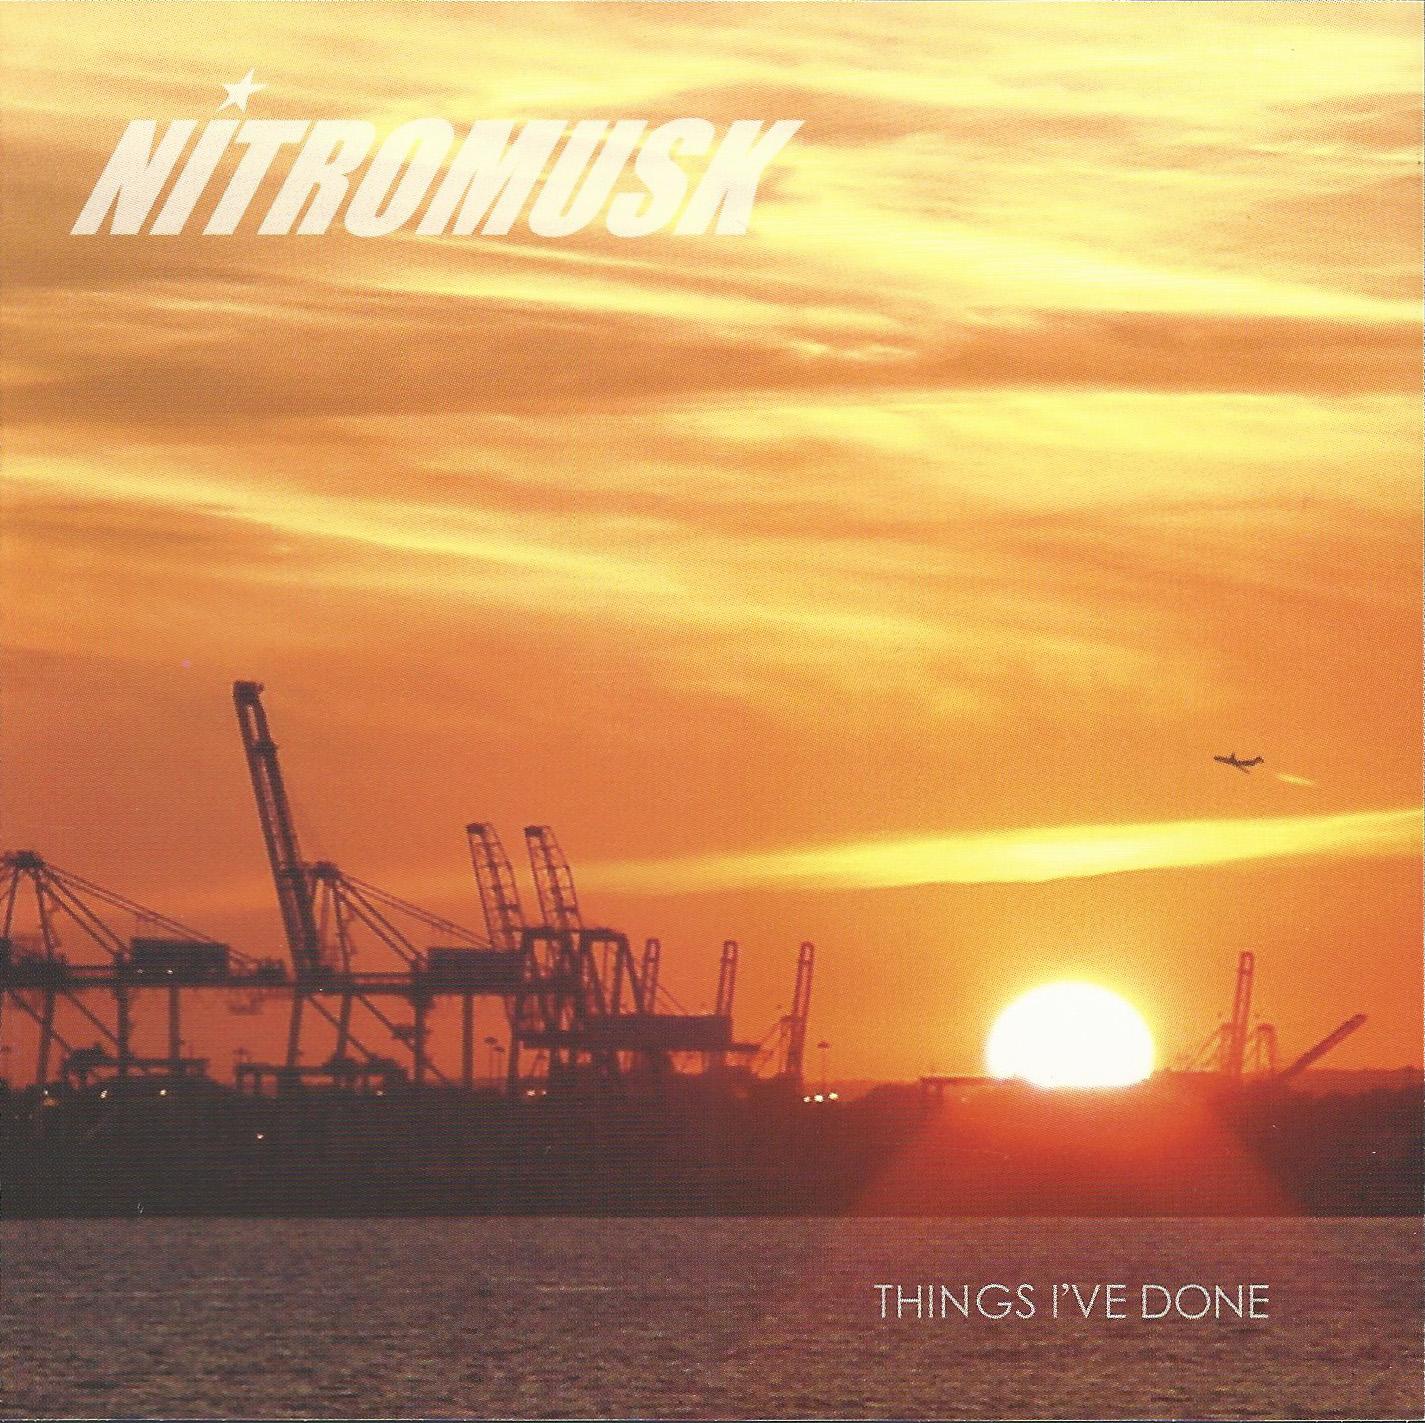 Nitromusk+Things+I've+Done